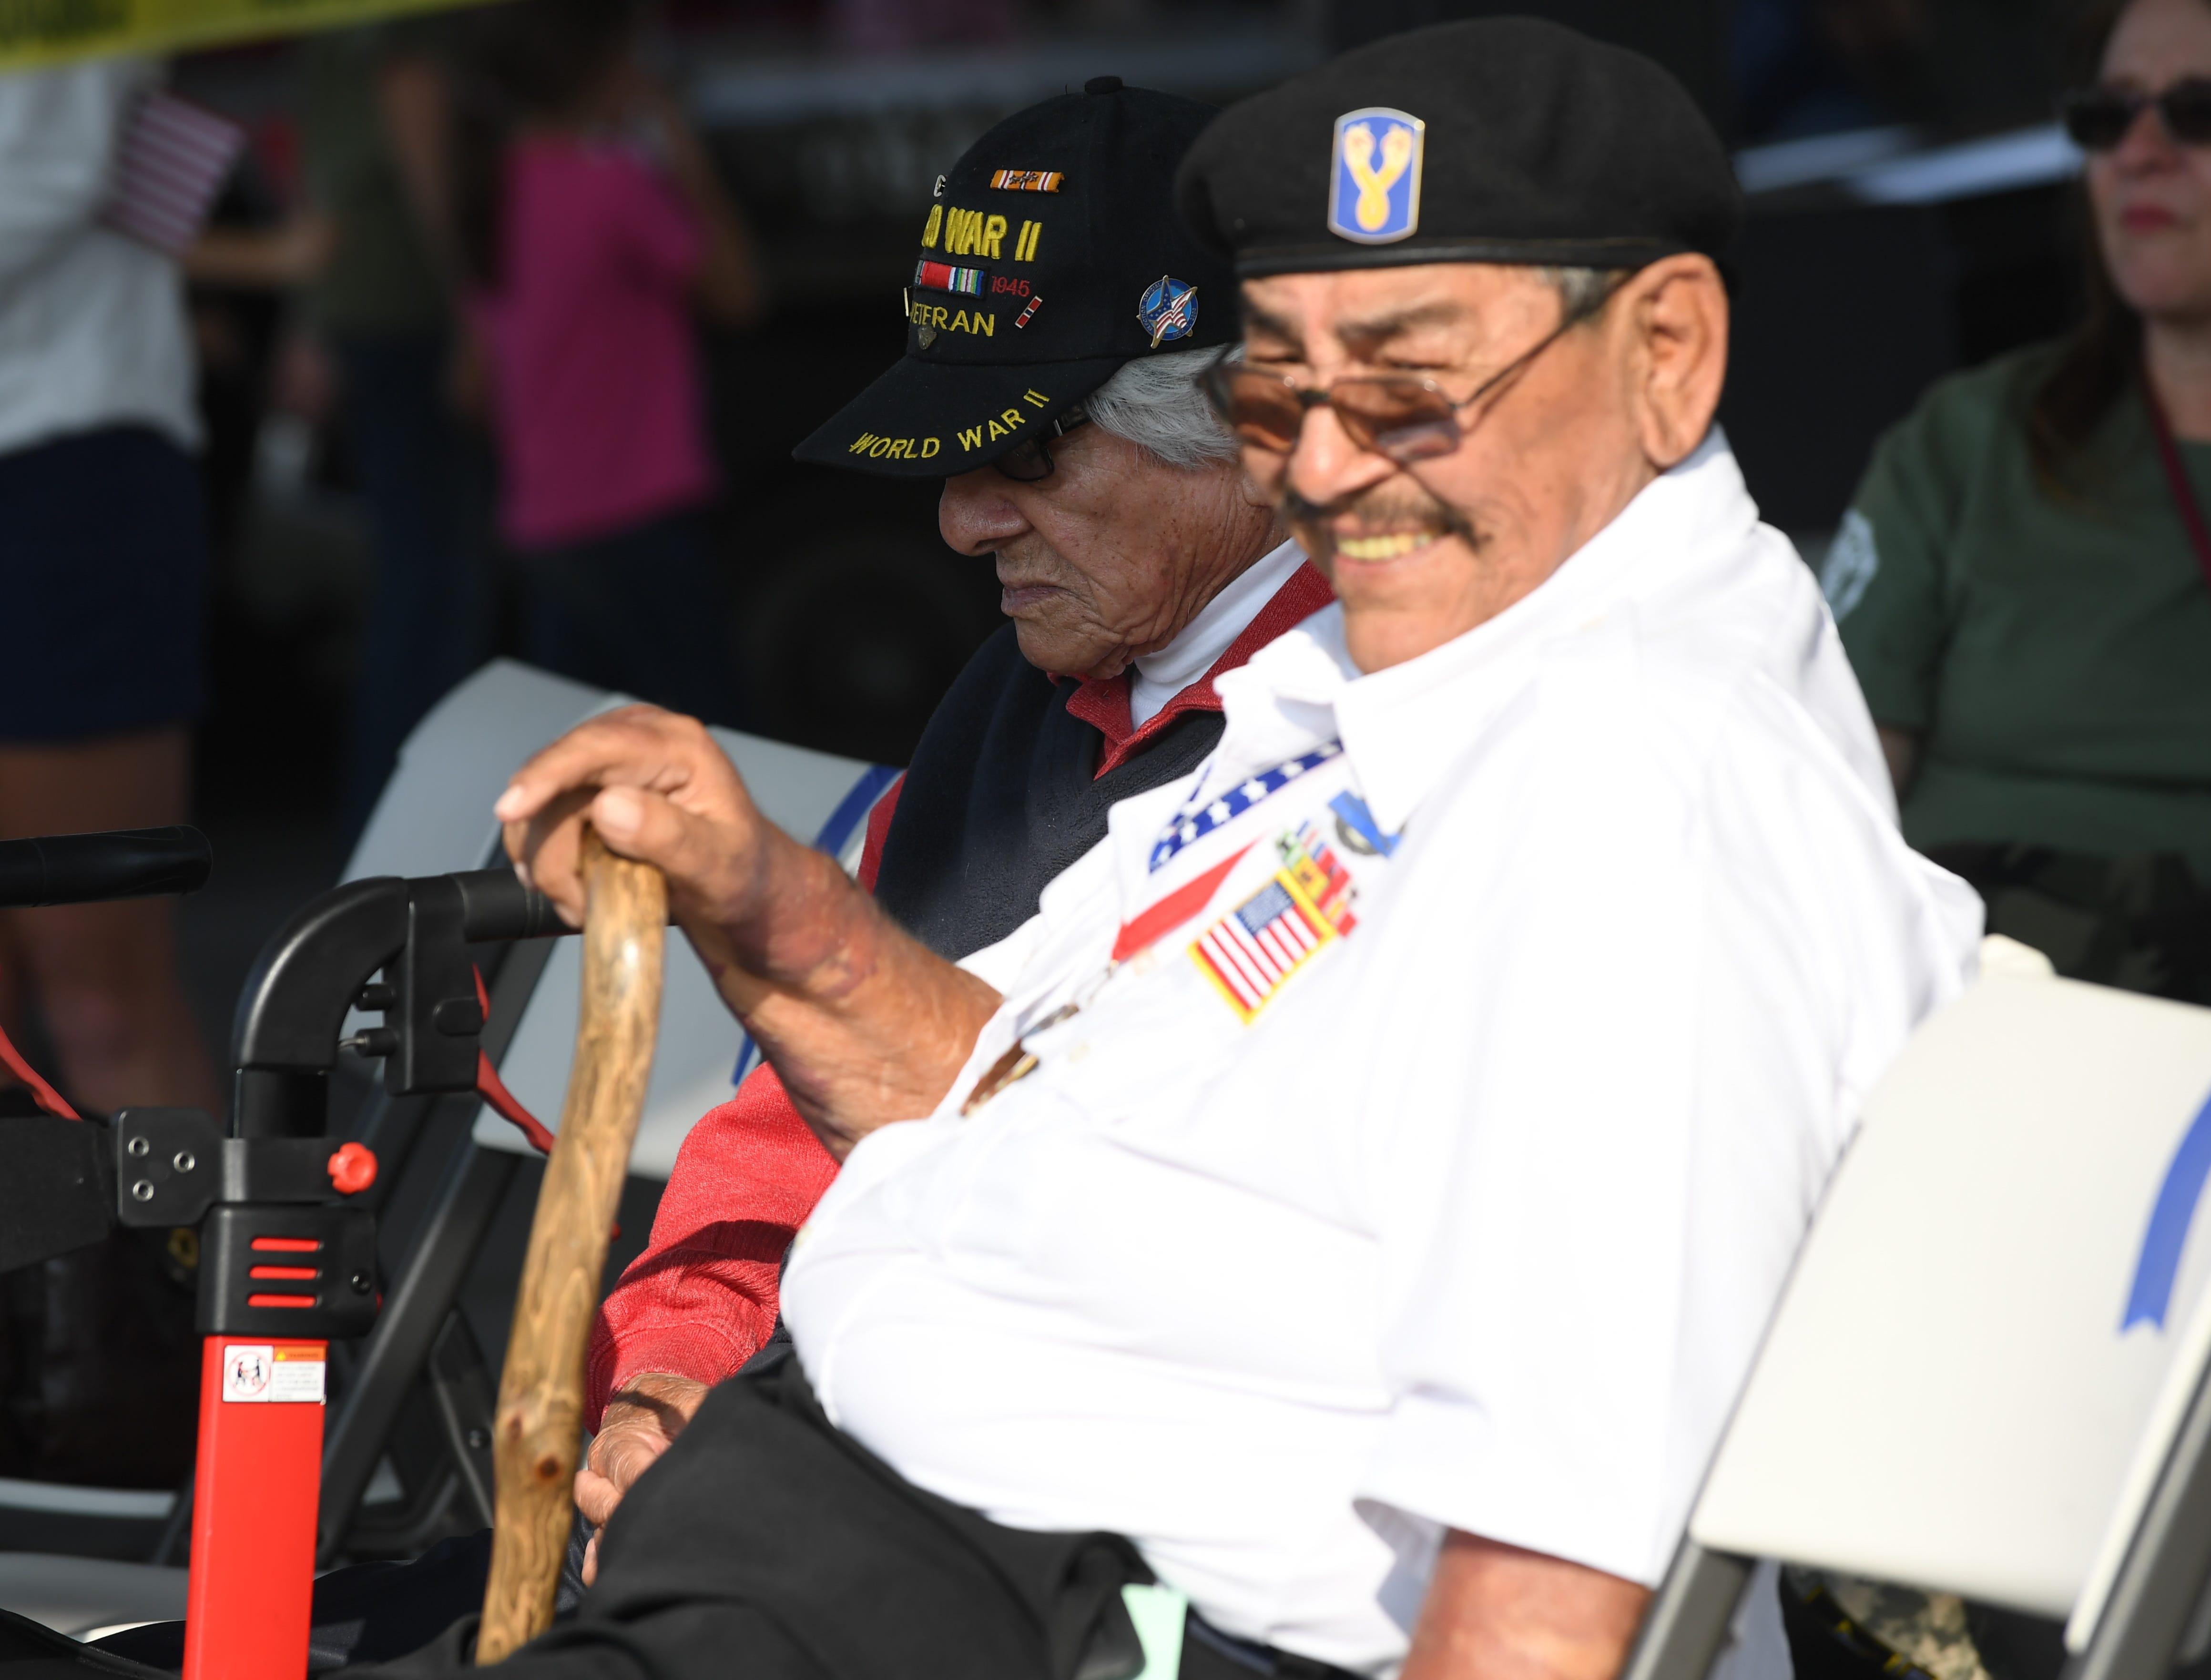 David Perez, left, a World War II veteran, sits with Salvador Armendariz, right, a Vietnam veteran, at Sunday's Monterey County Veterans Day Parade in Salinas.